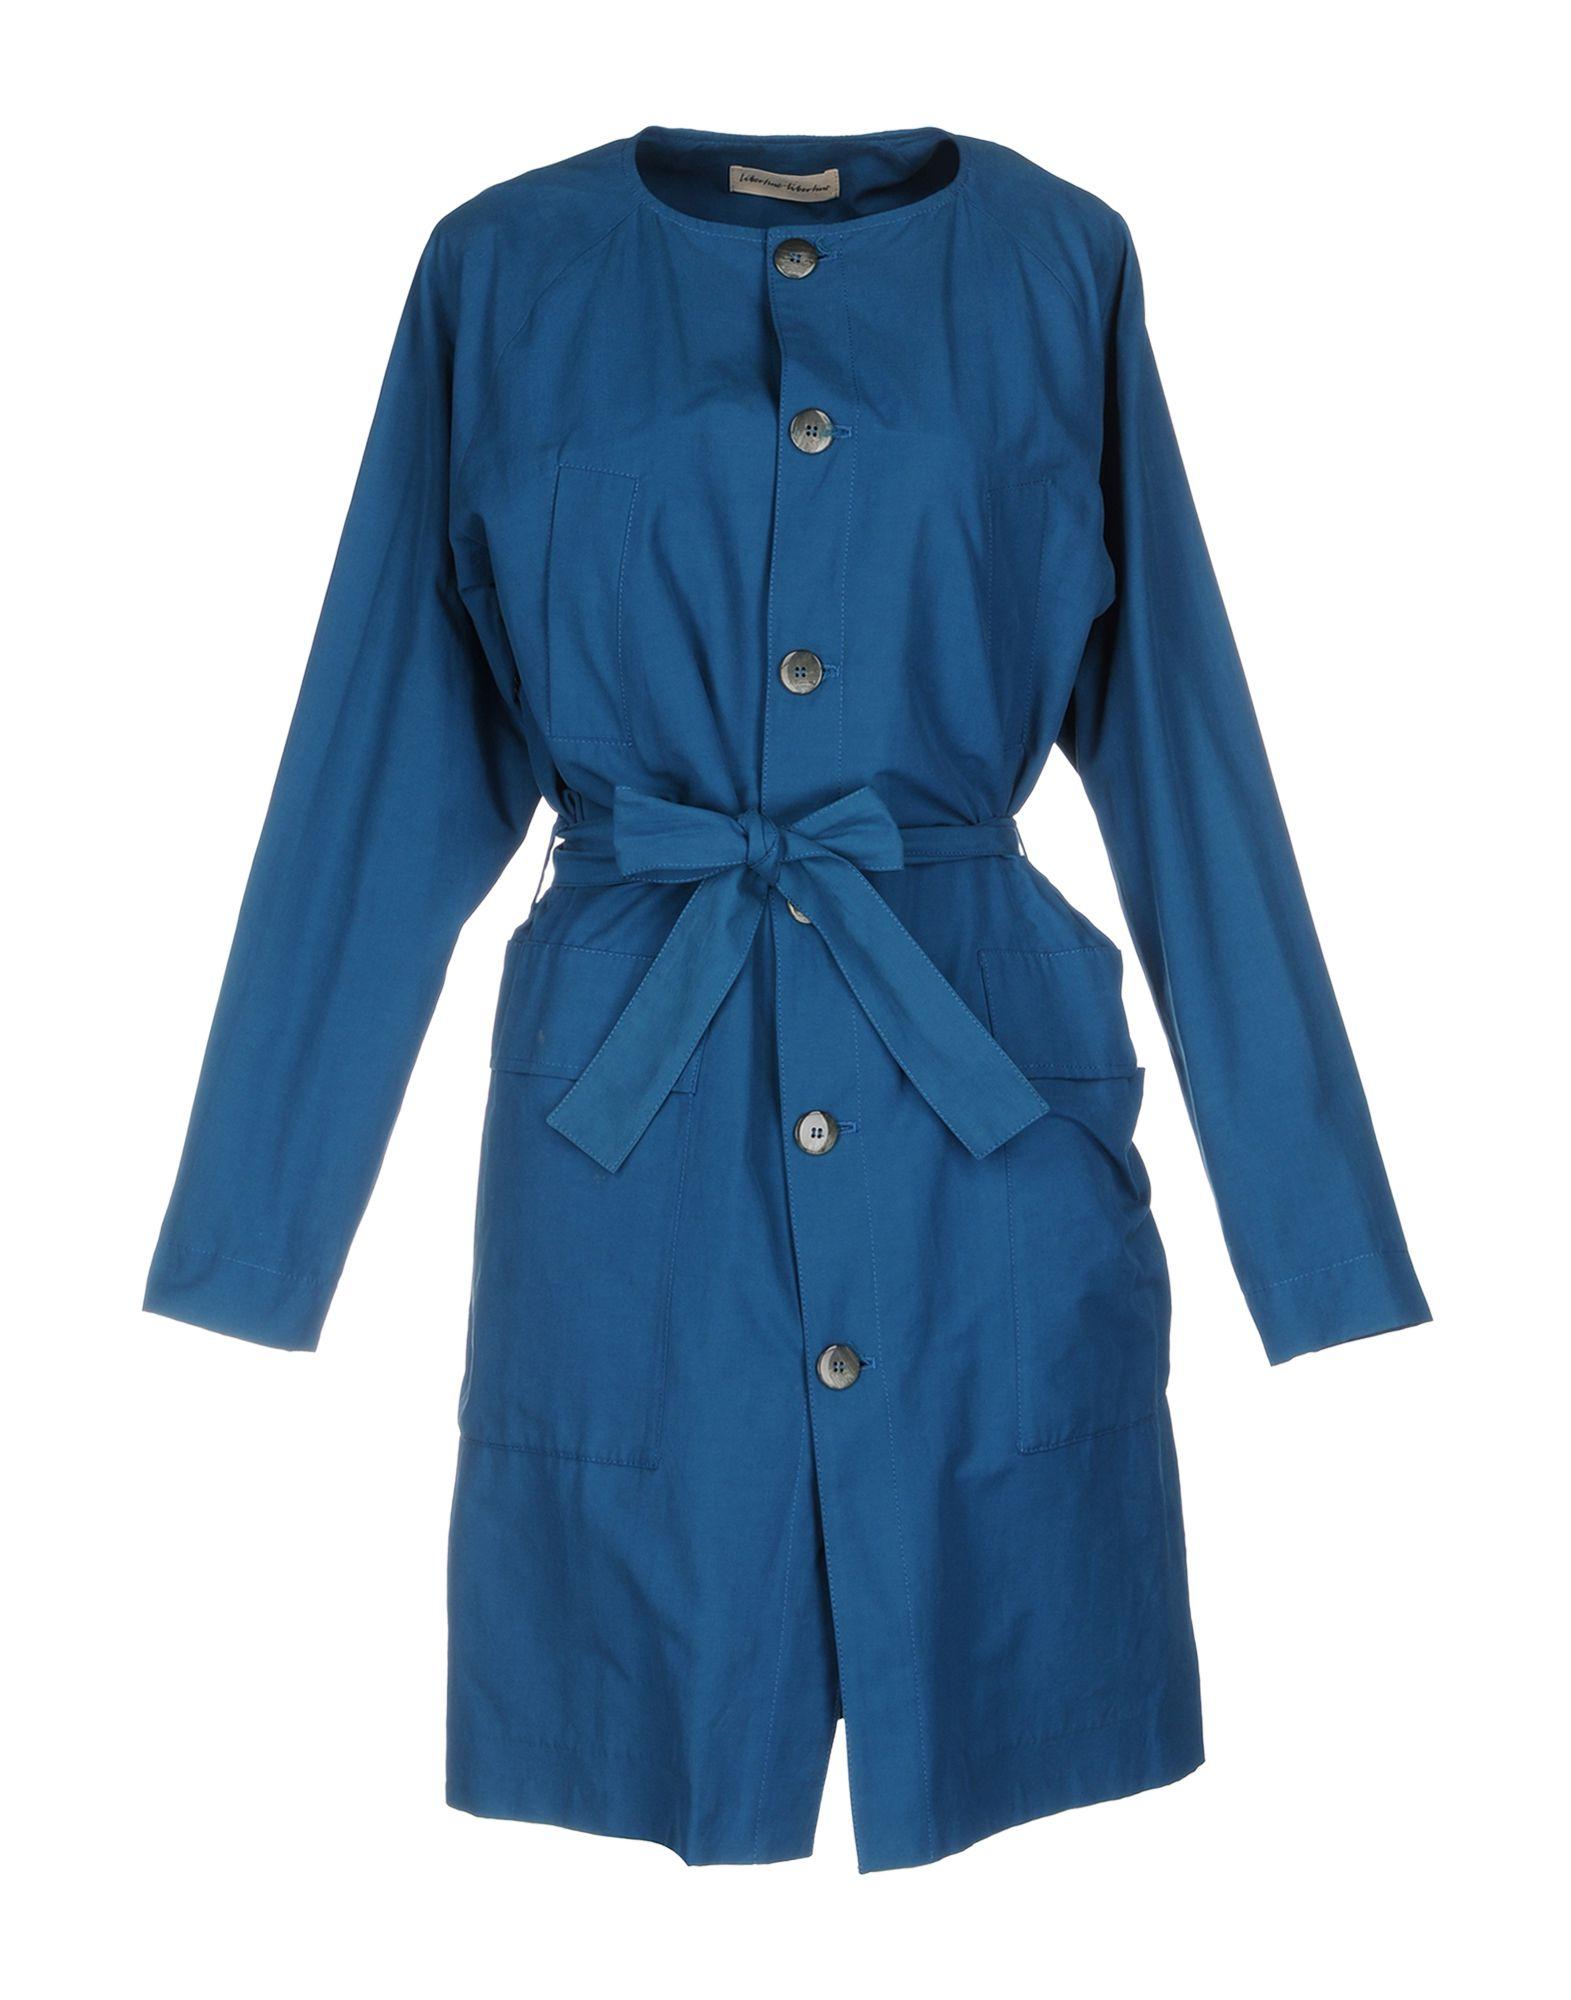 LIBERTINE-LIBERTINE Belted Coats in Pastel Blue